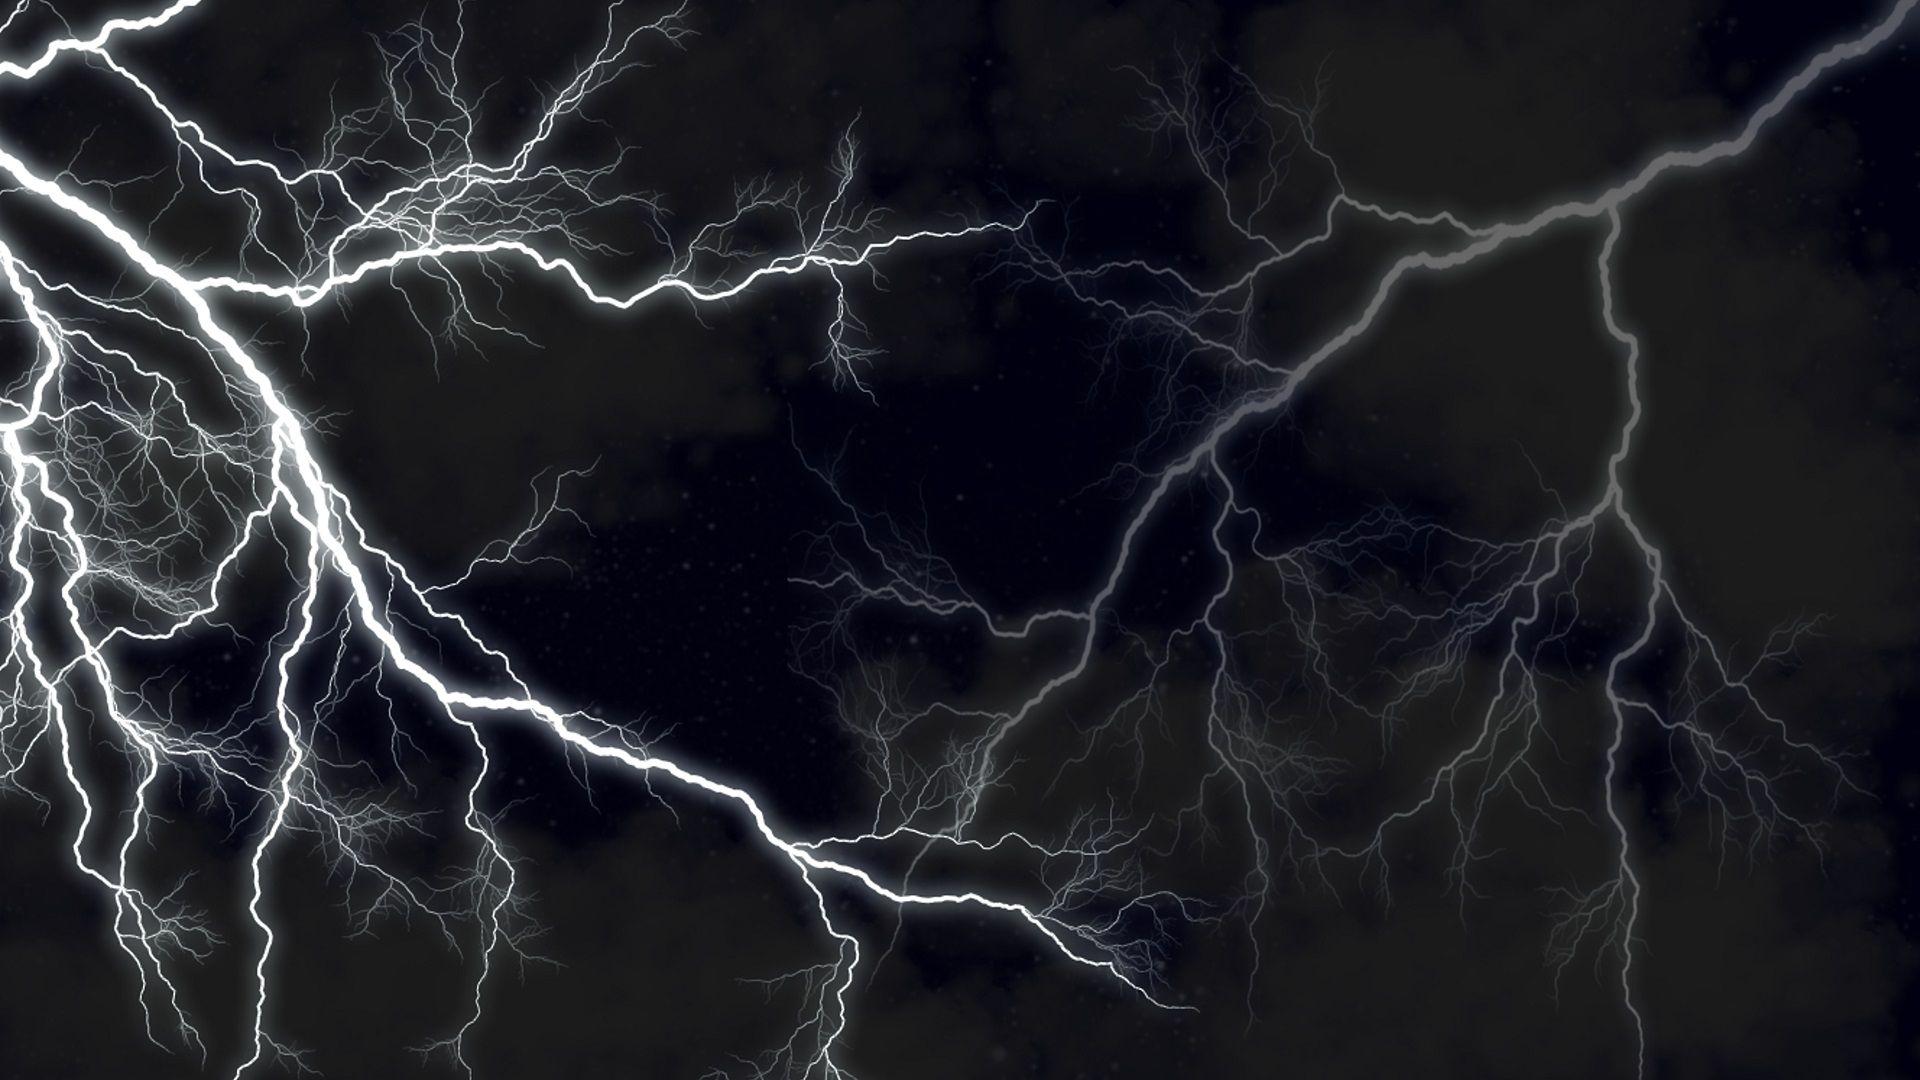 Lightning Strikes Wallpaper Текстуры, Обои